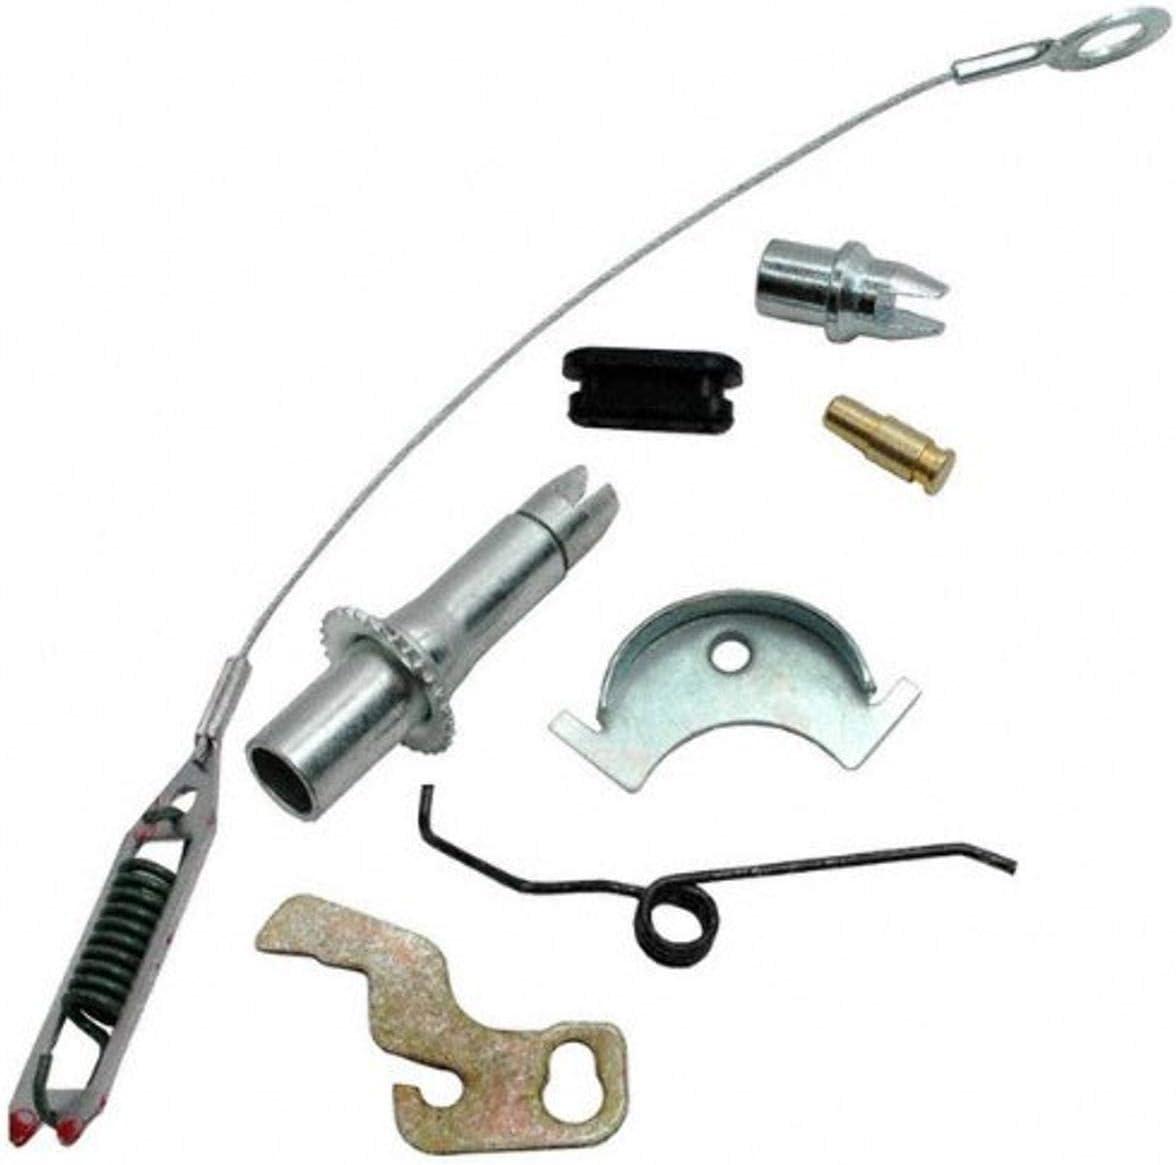 Raybestos price H2528 Professional Very popular Grade Drum Shoe Kit Adjuster Brake